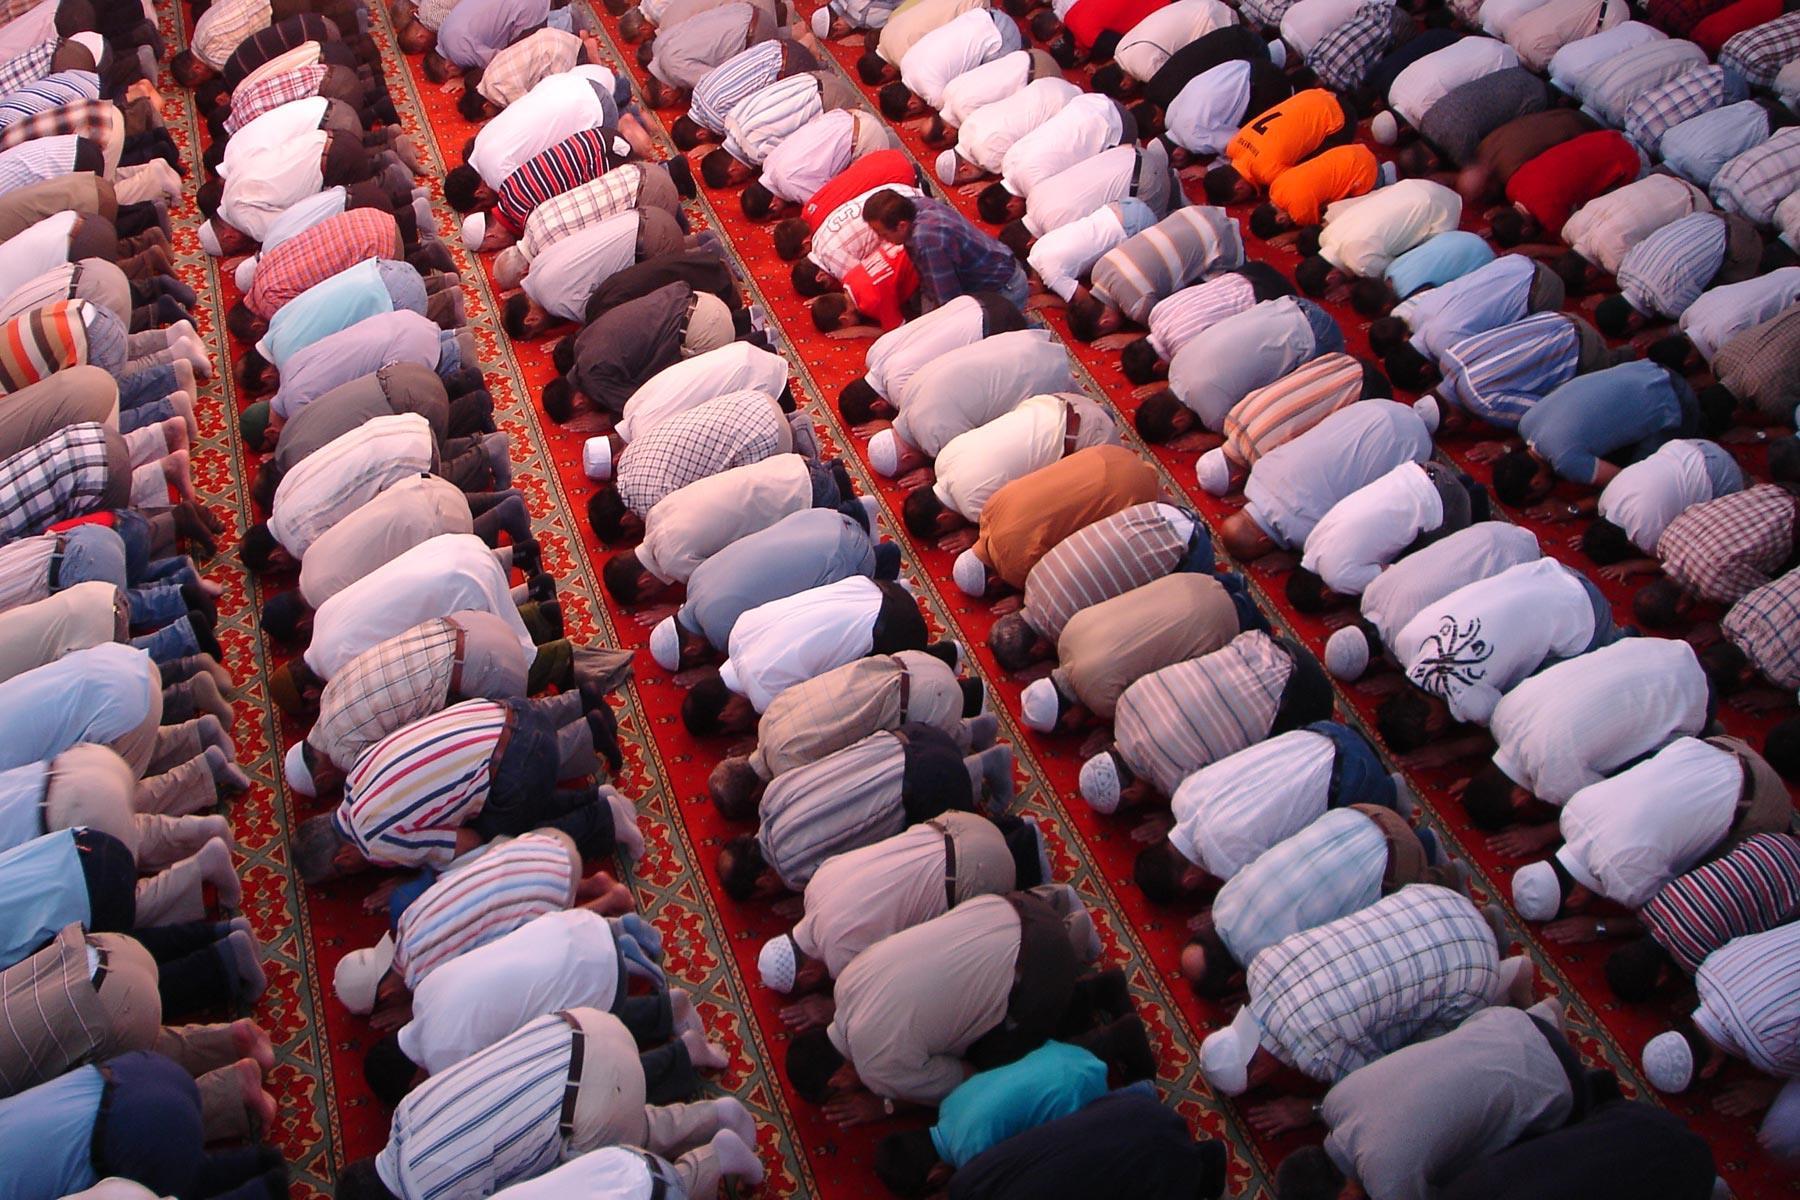 Islam Escapes Royal Commission Scrutiny